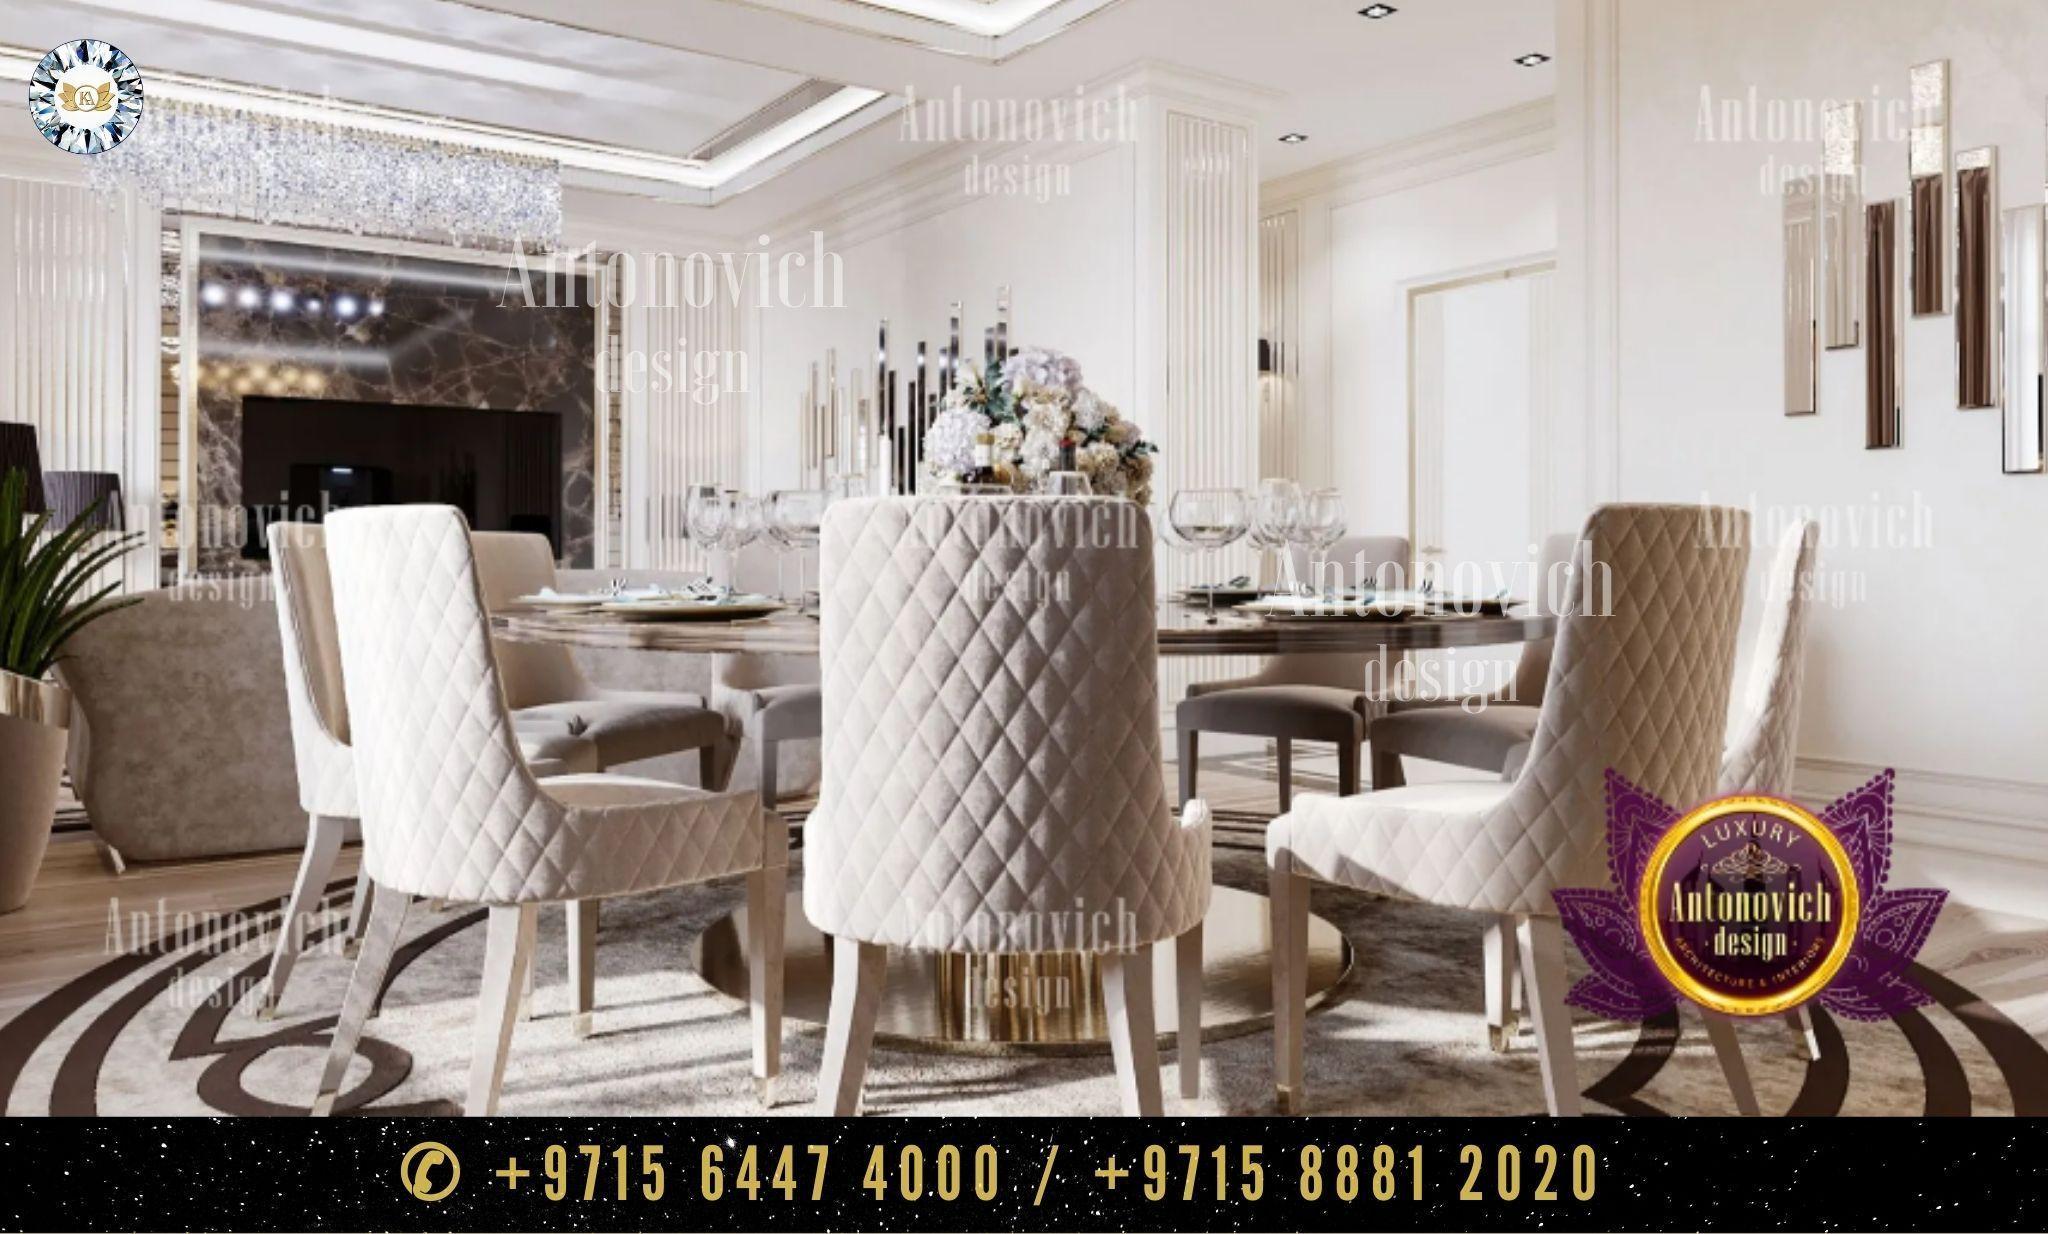 Turnkey Interiors Elite Fit Out Modern Dining Room Design تصميم غرفة طعام حديثةut Elegant Interior Design Interior Design Interior Design Dubai